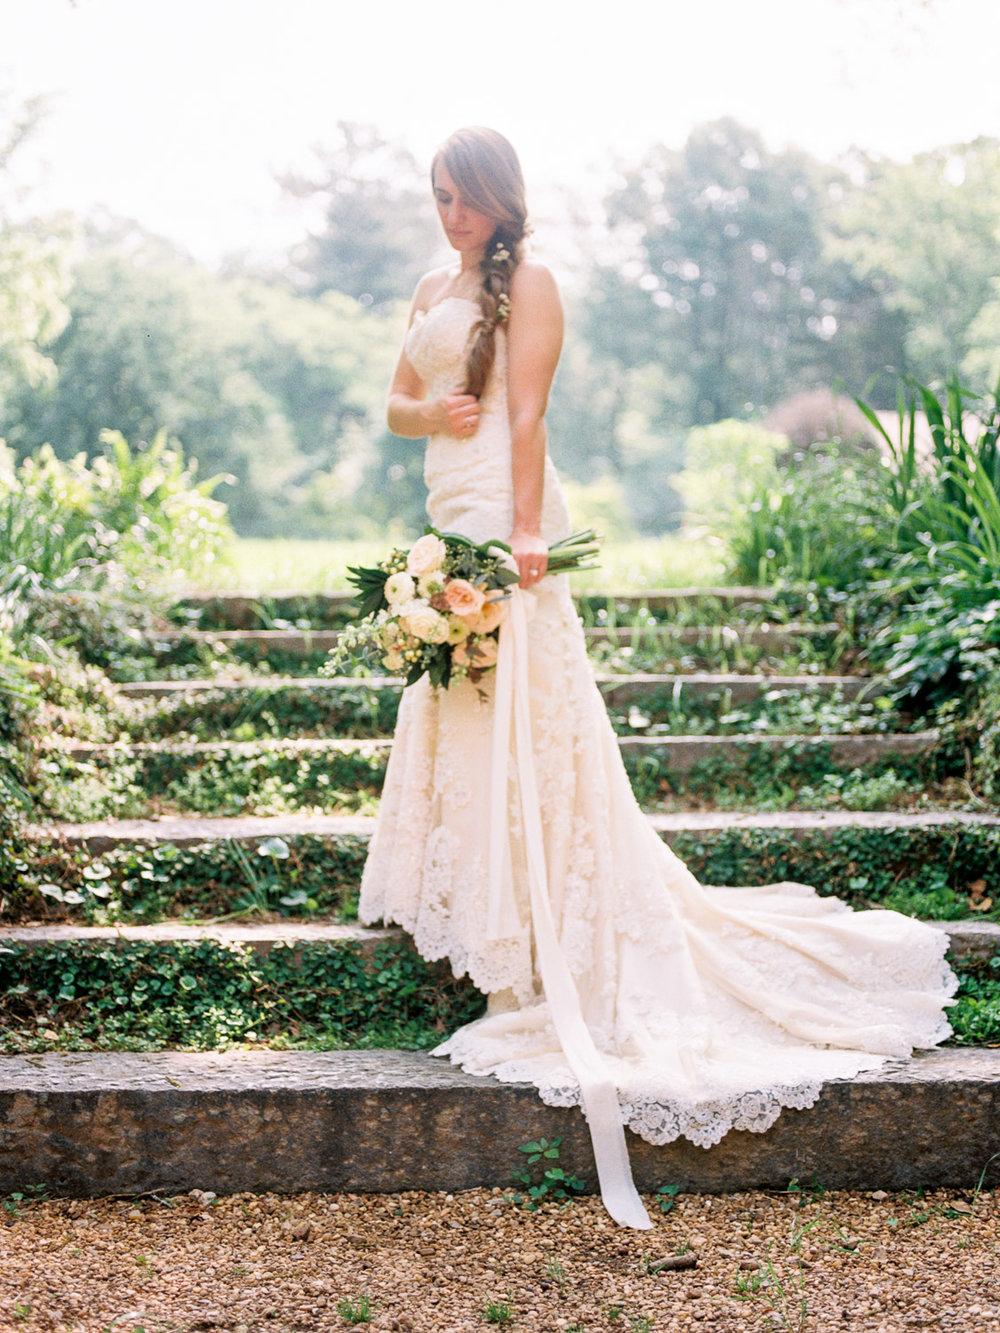 christinadavisphotography-romanticwedding-gardenweddinginspiration17.jpg